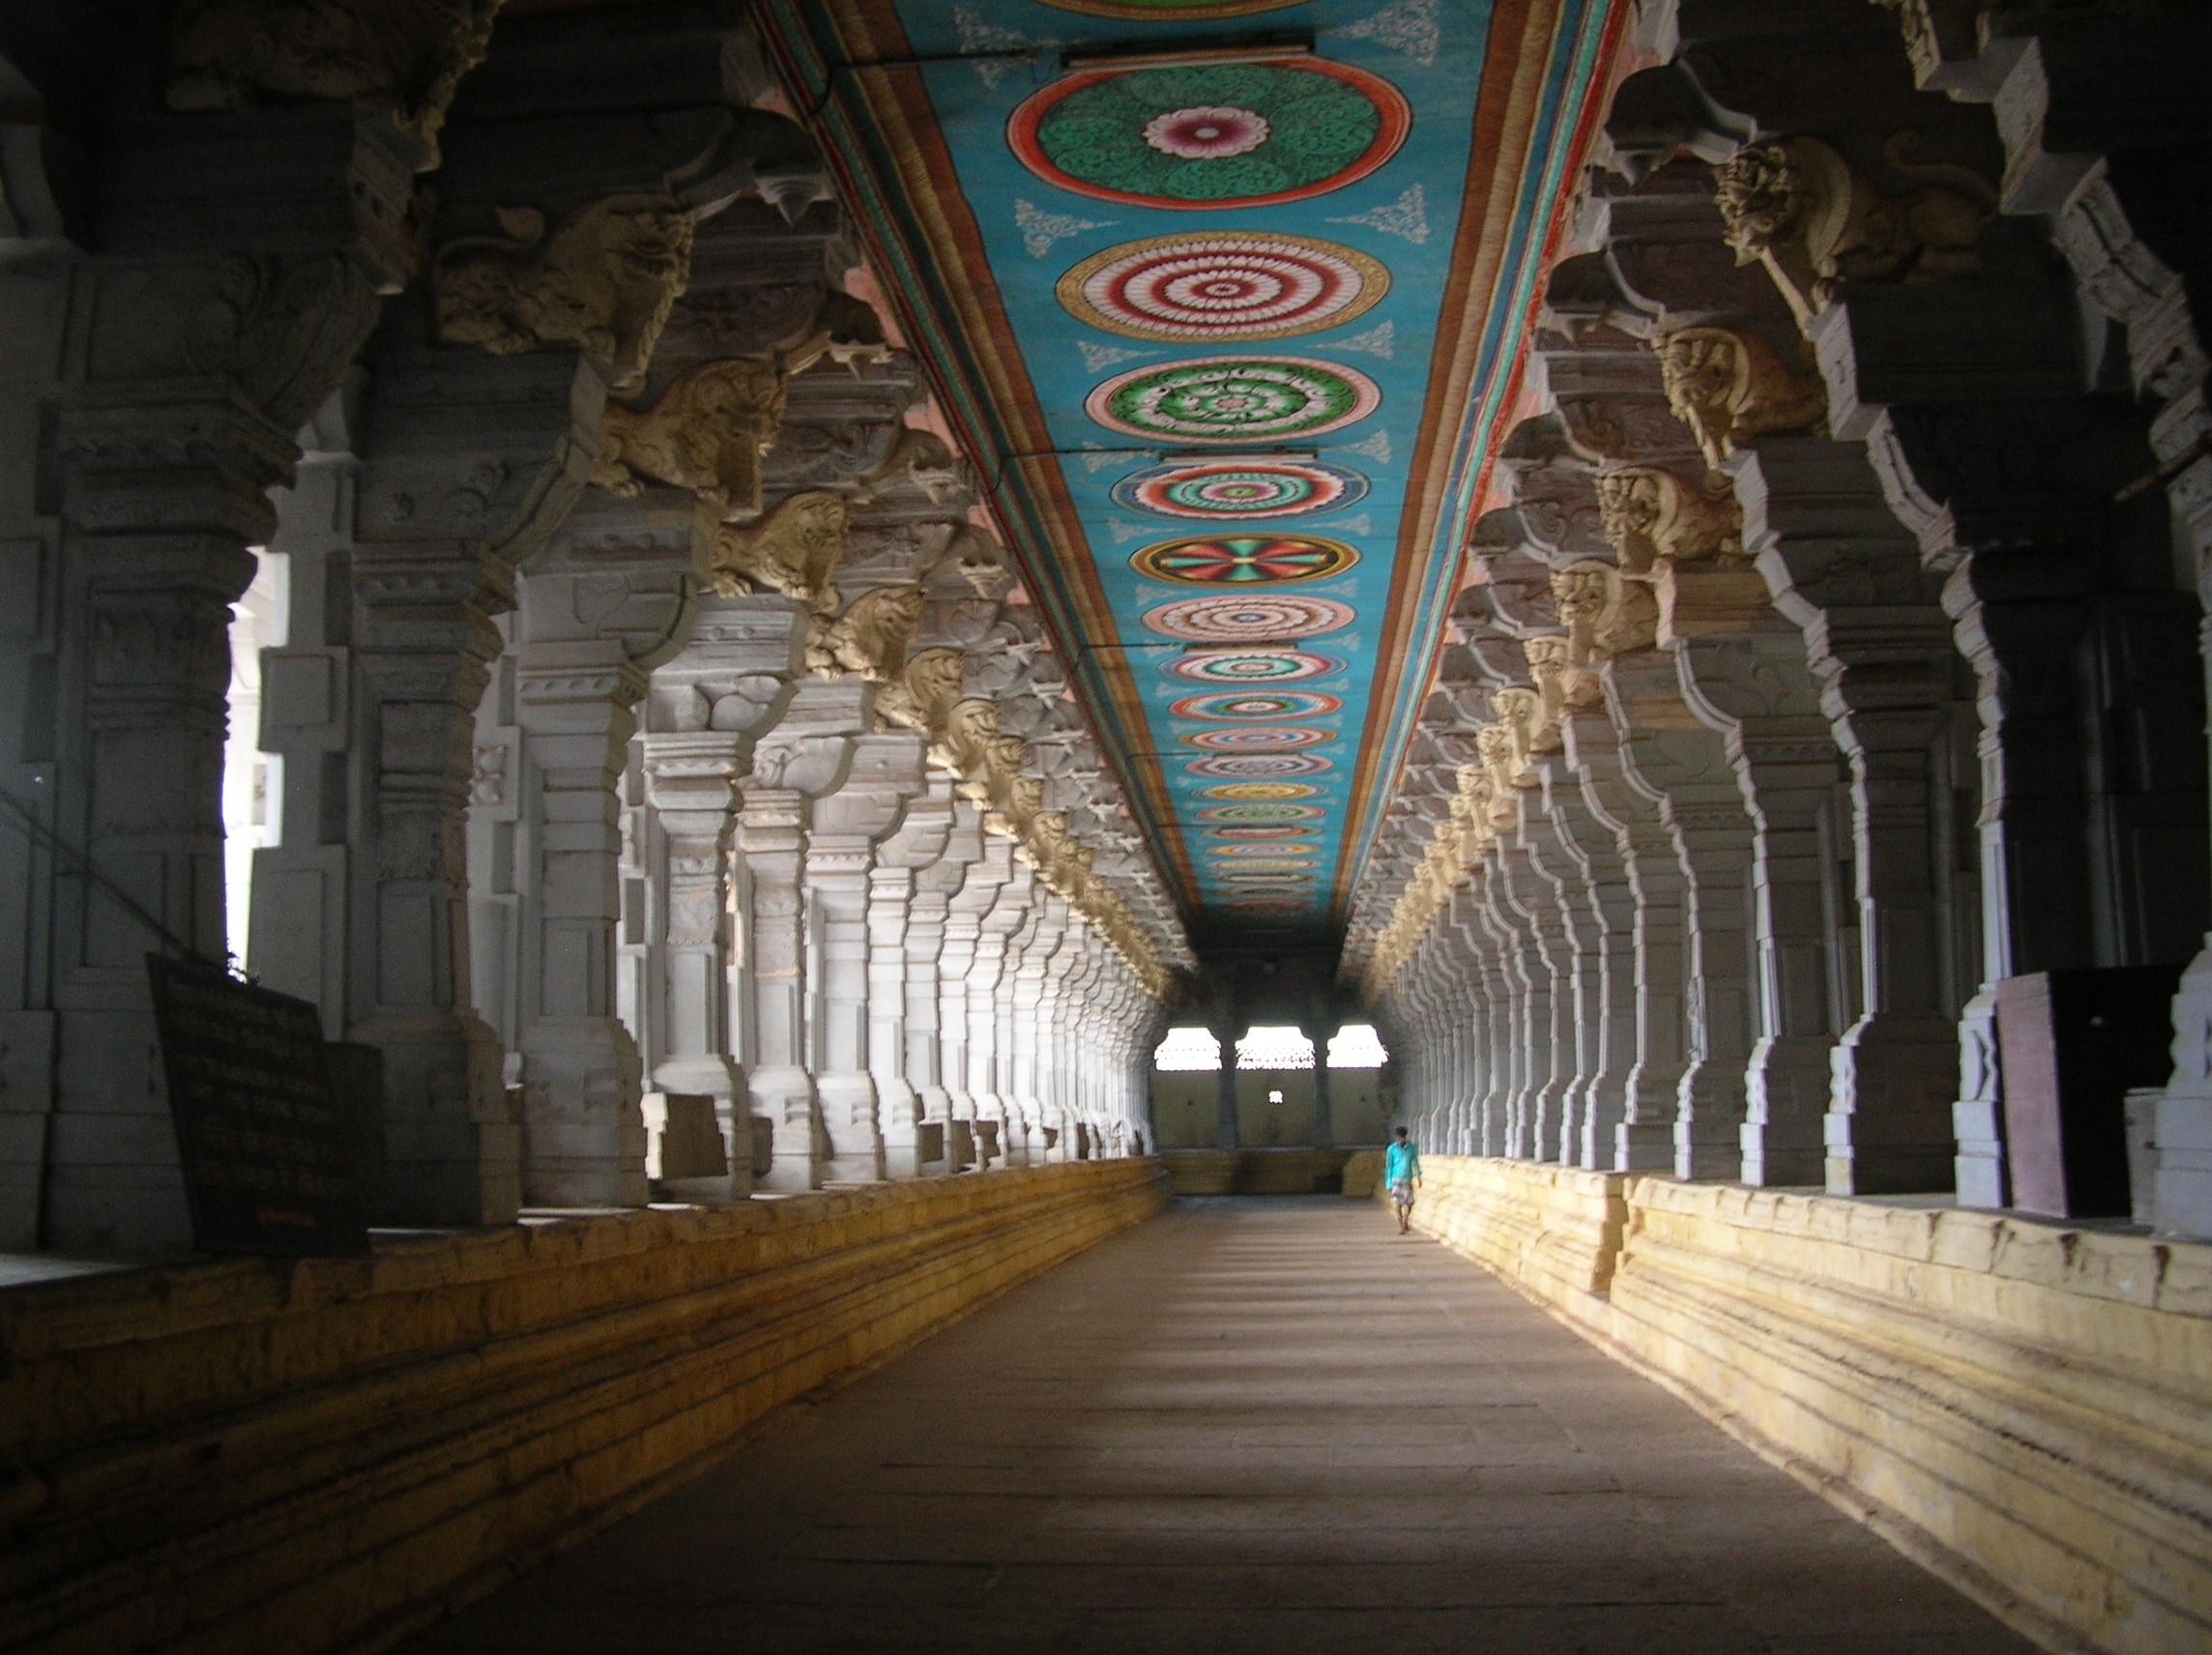 File:Rameswaram Temple Inside.jpg - Wikimedia Commons